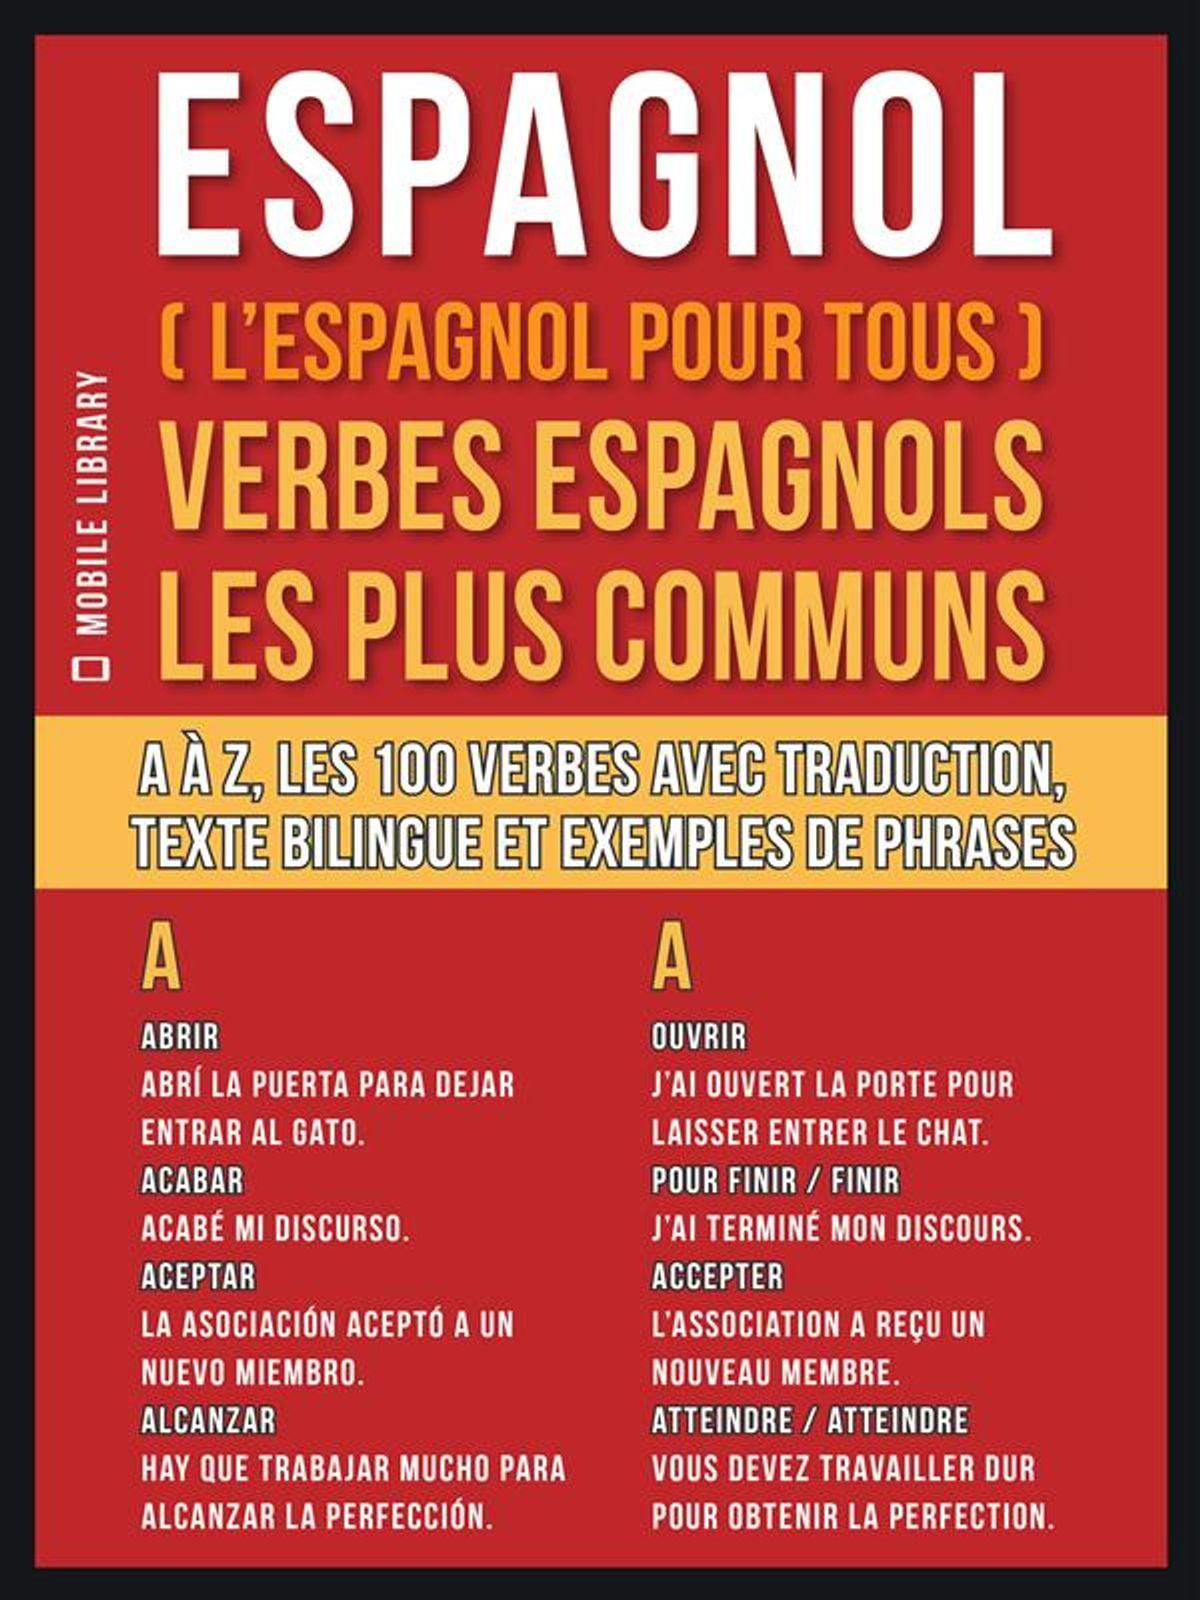 Espagnol L Espagnol Pour Tous Verbes Espagnols Les Plus Communs Ebook Walmart Com Walmart Com